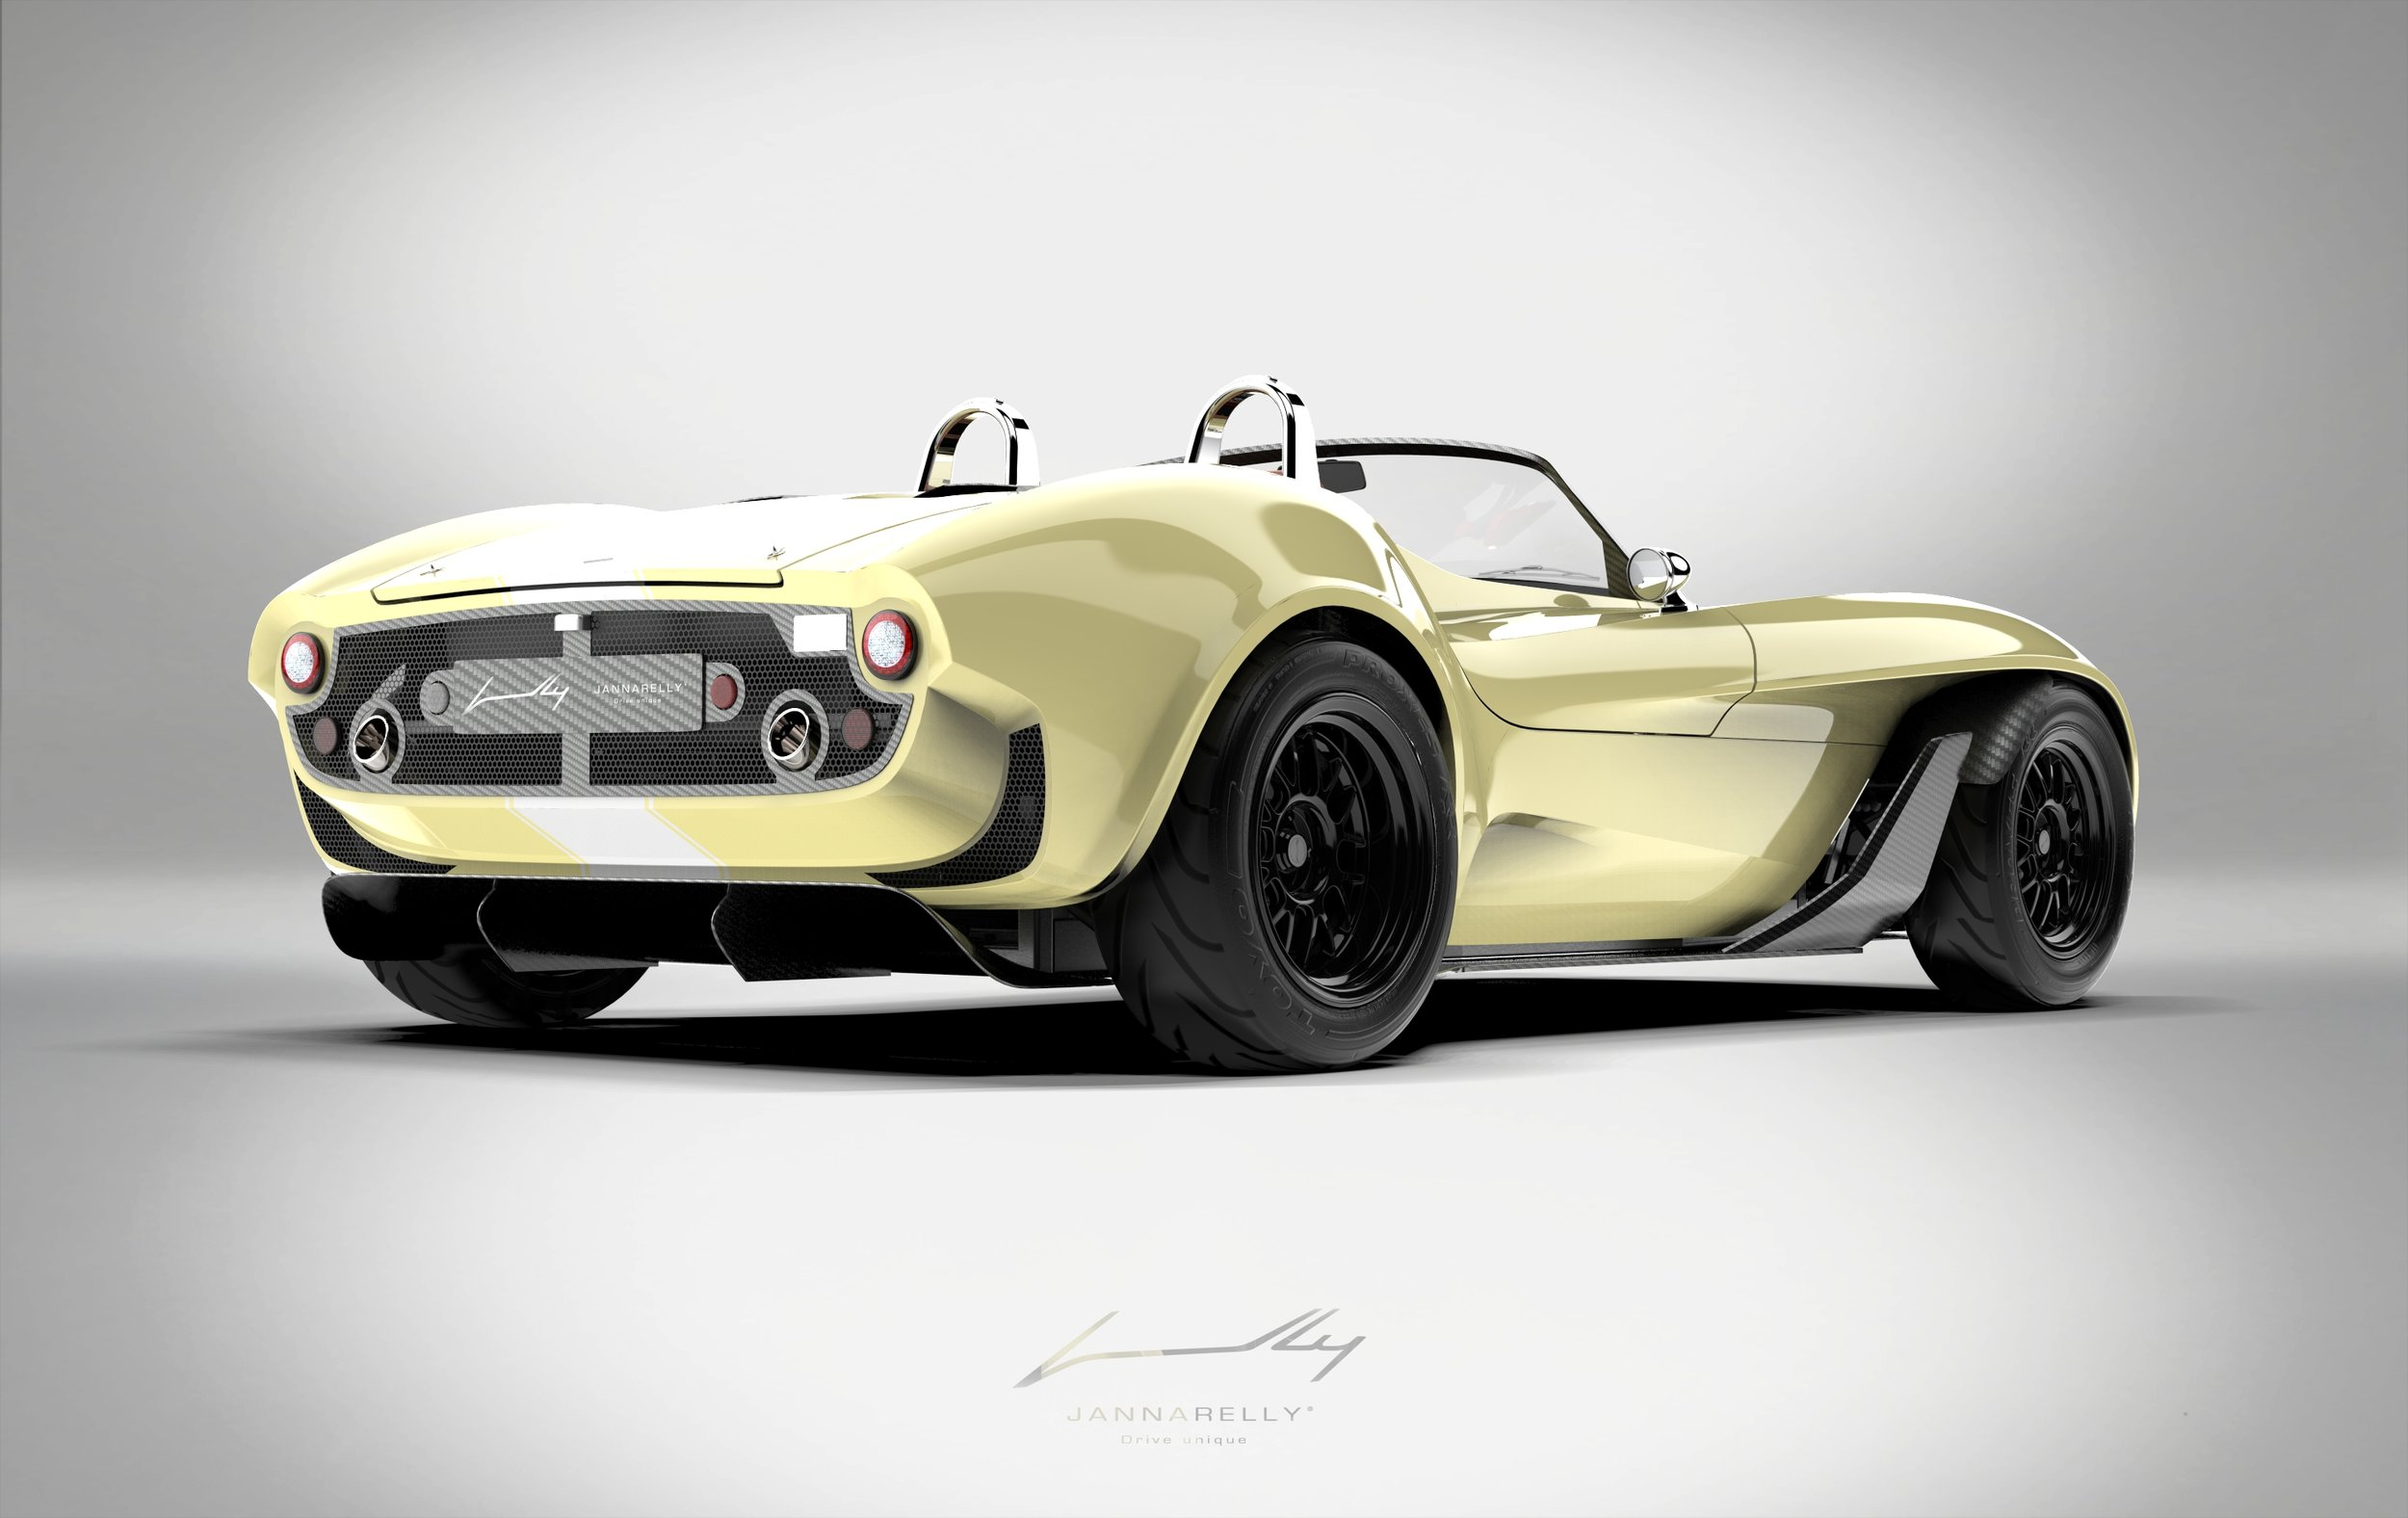 J design1 roadster.314.jpg